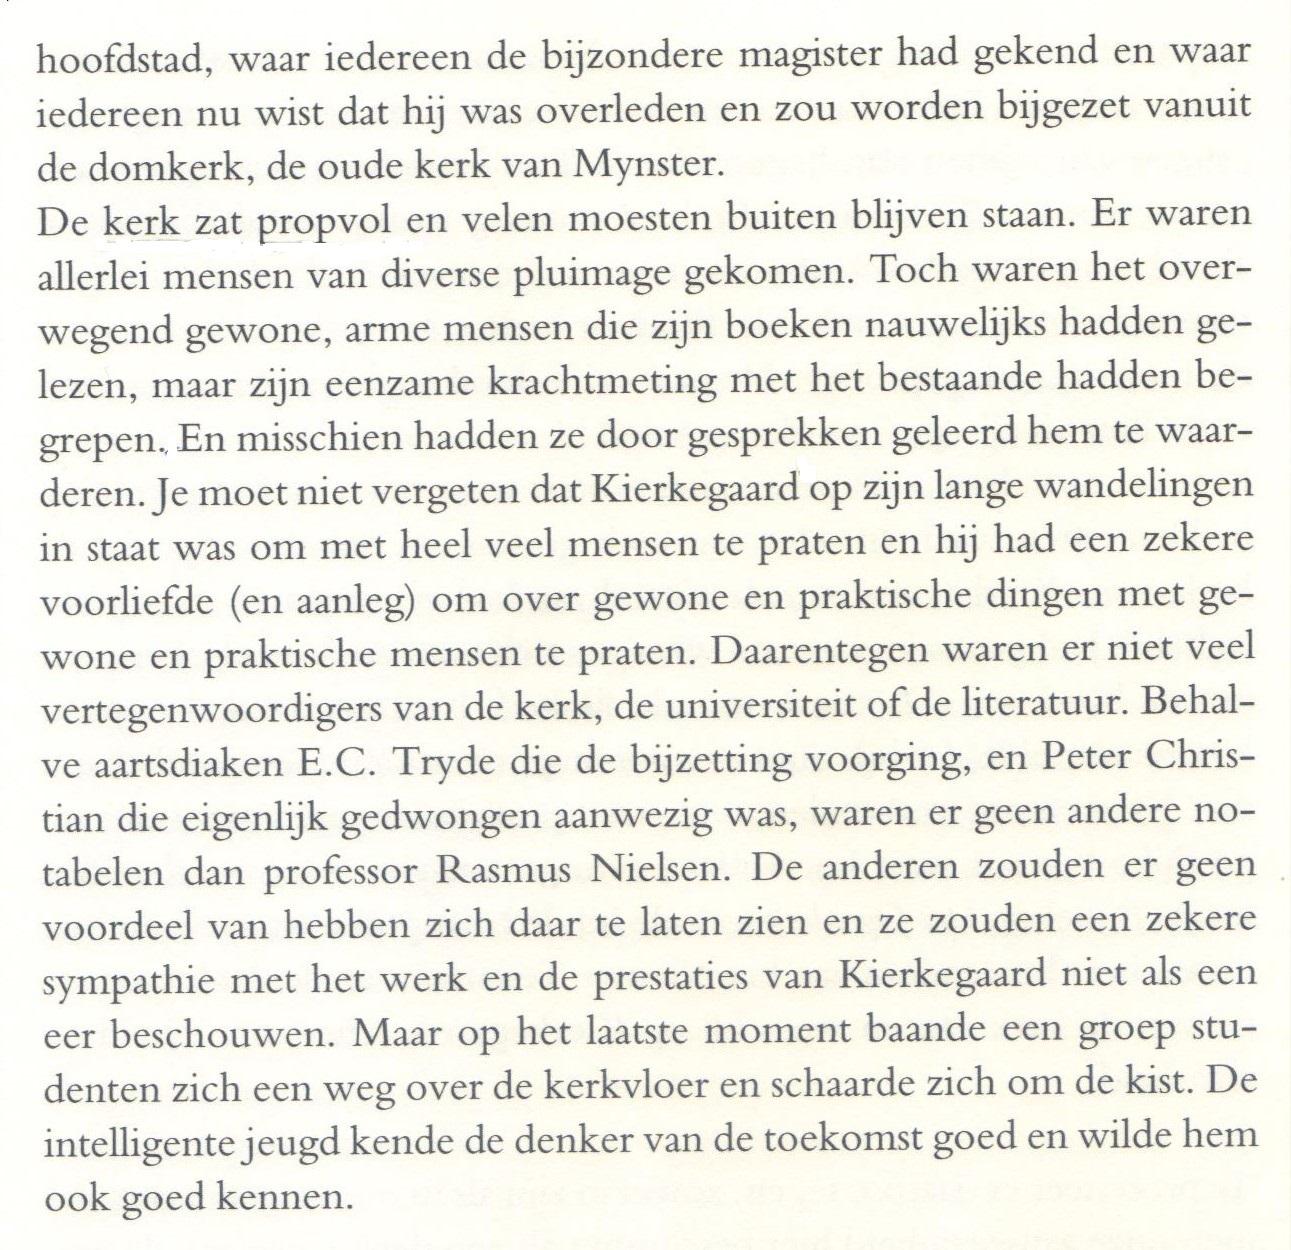 kierkegaard-002